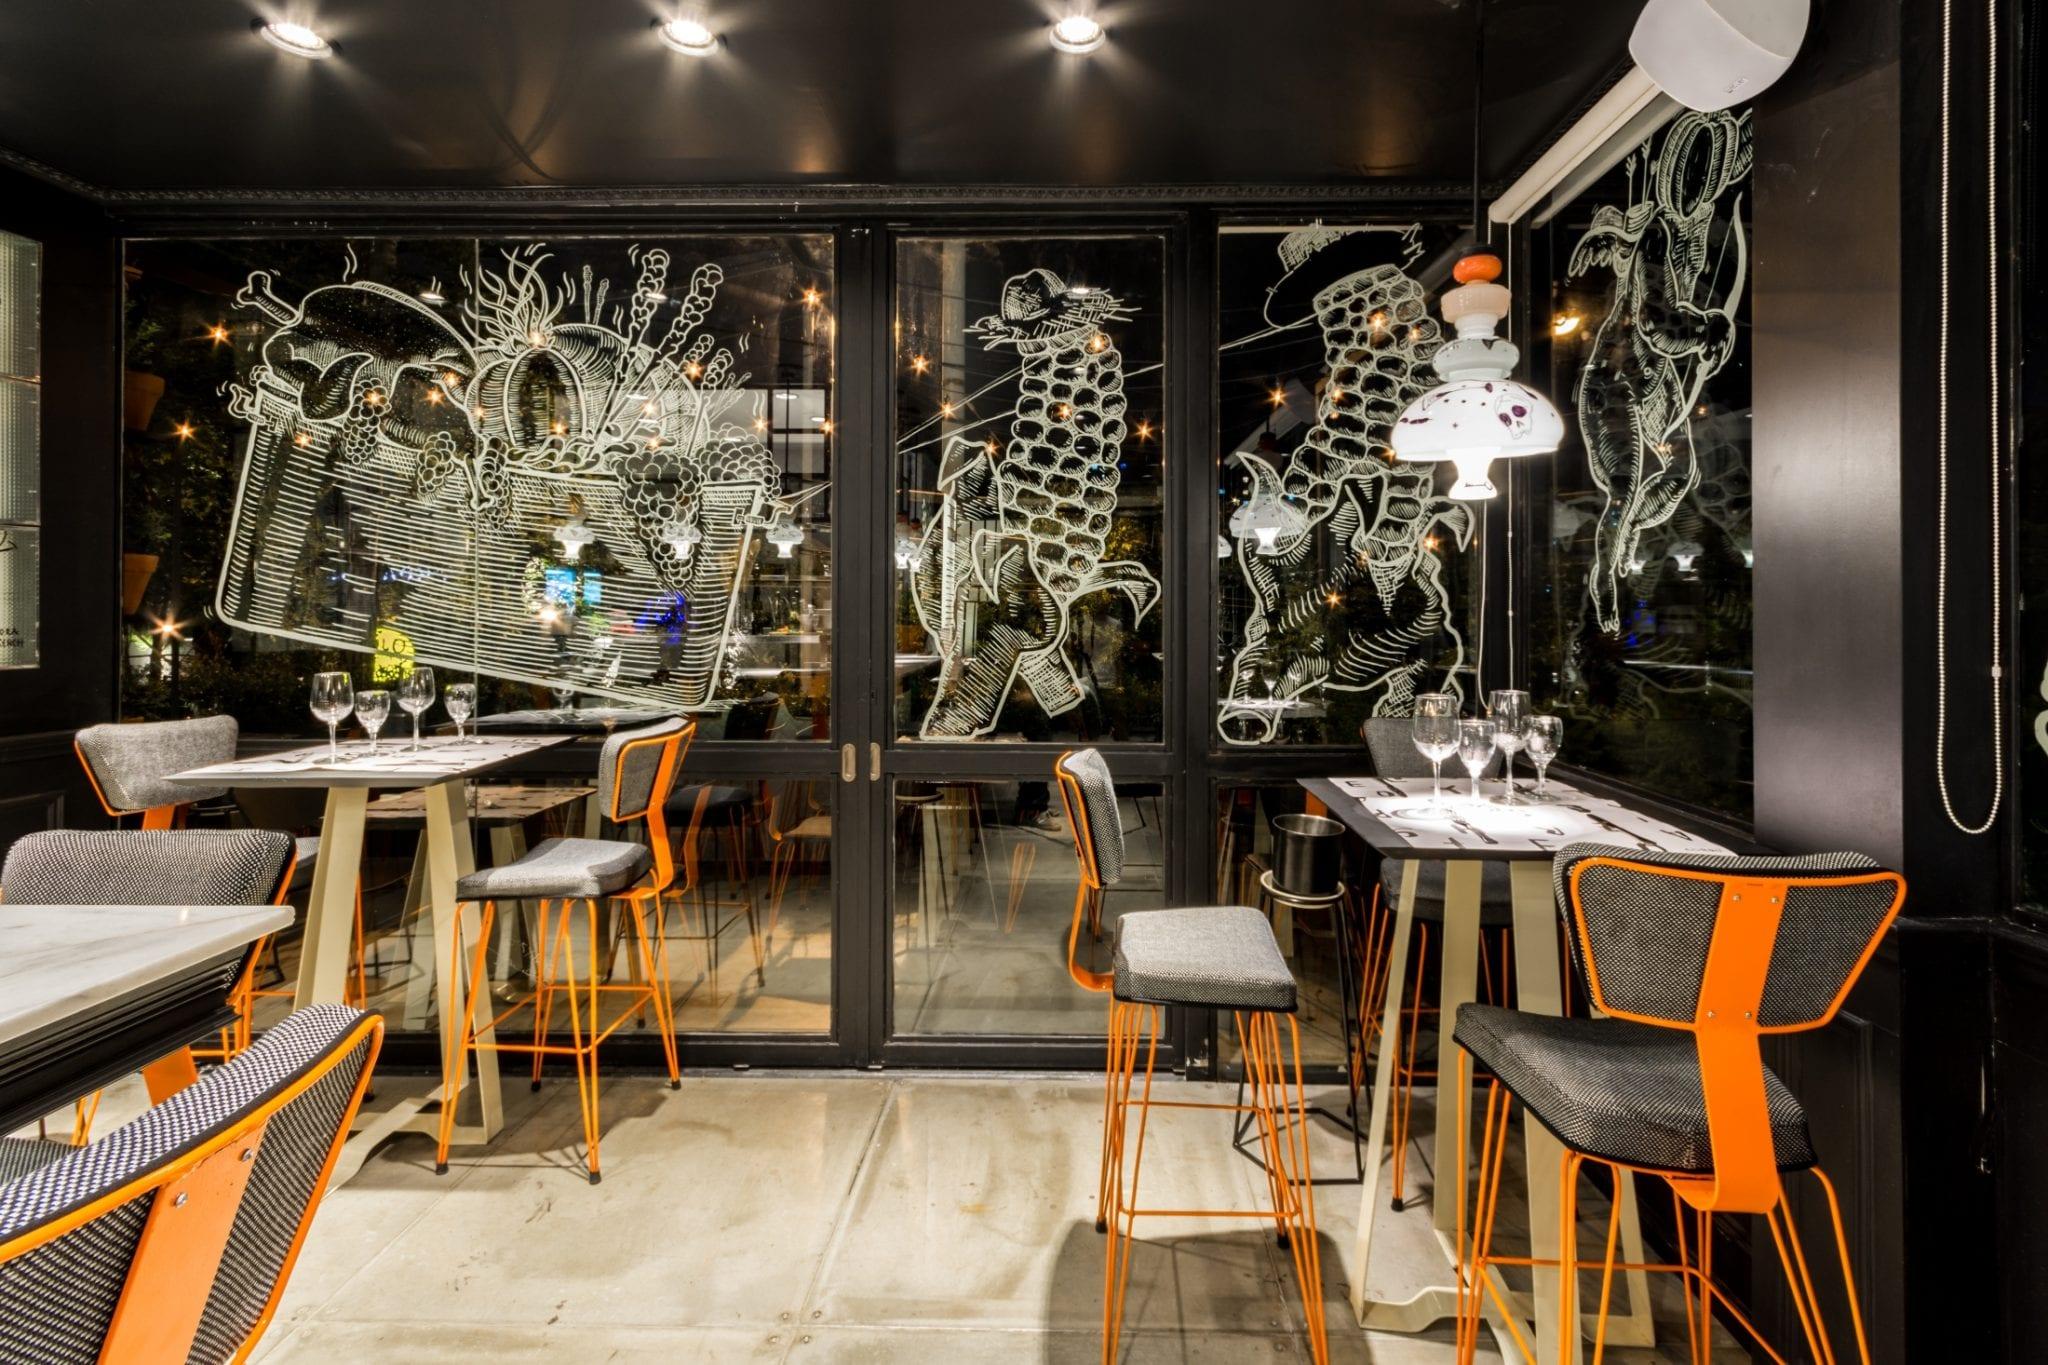 090317  -  Gordo Restoran ph G Viramonte-4465